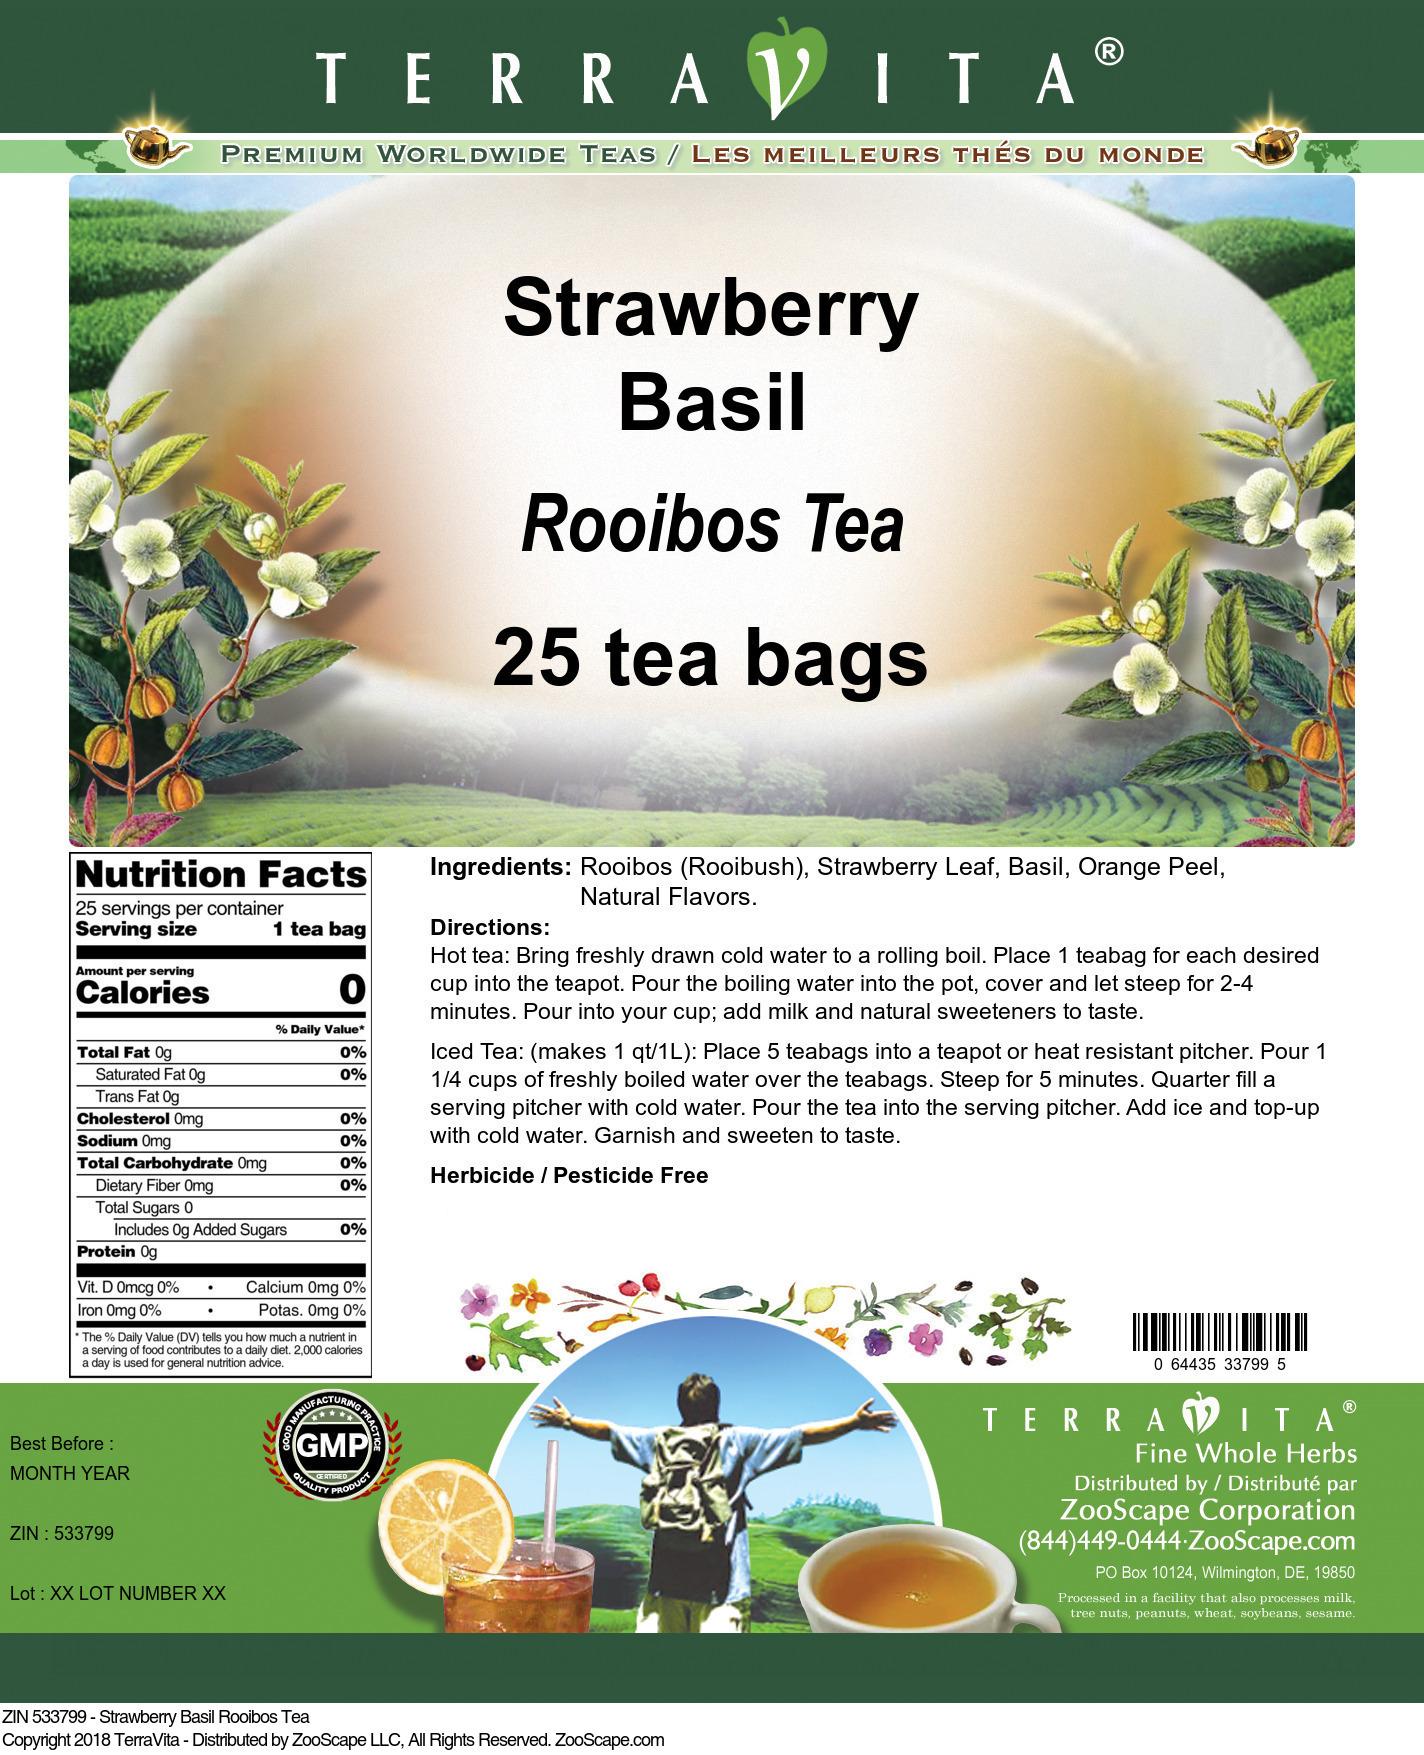 Strawberry Basil Rooibos Tea